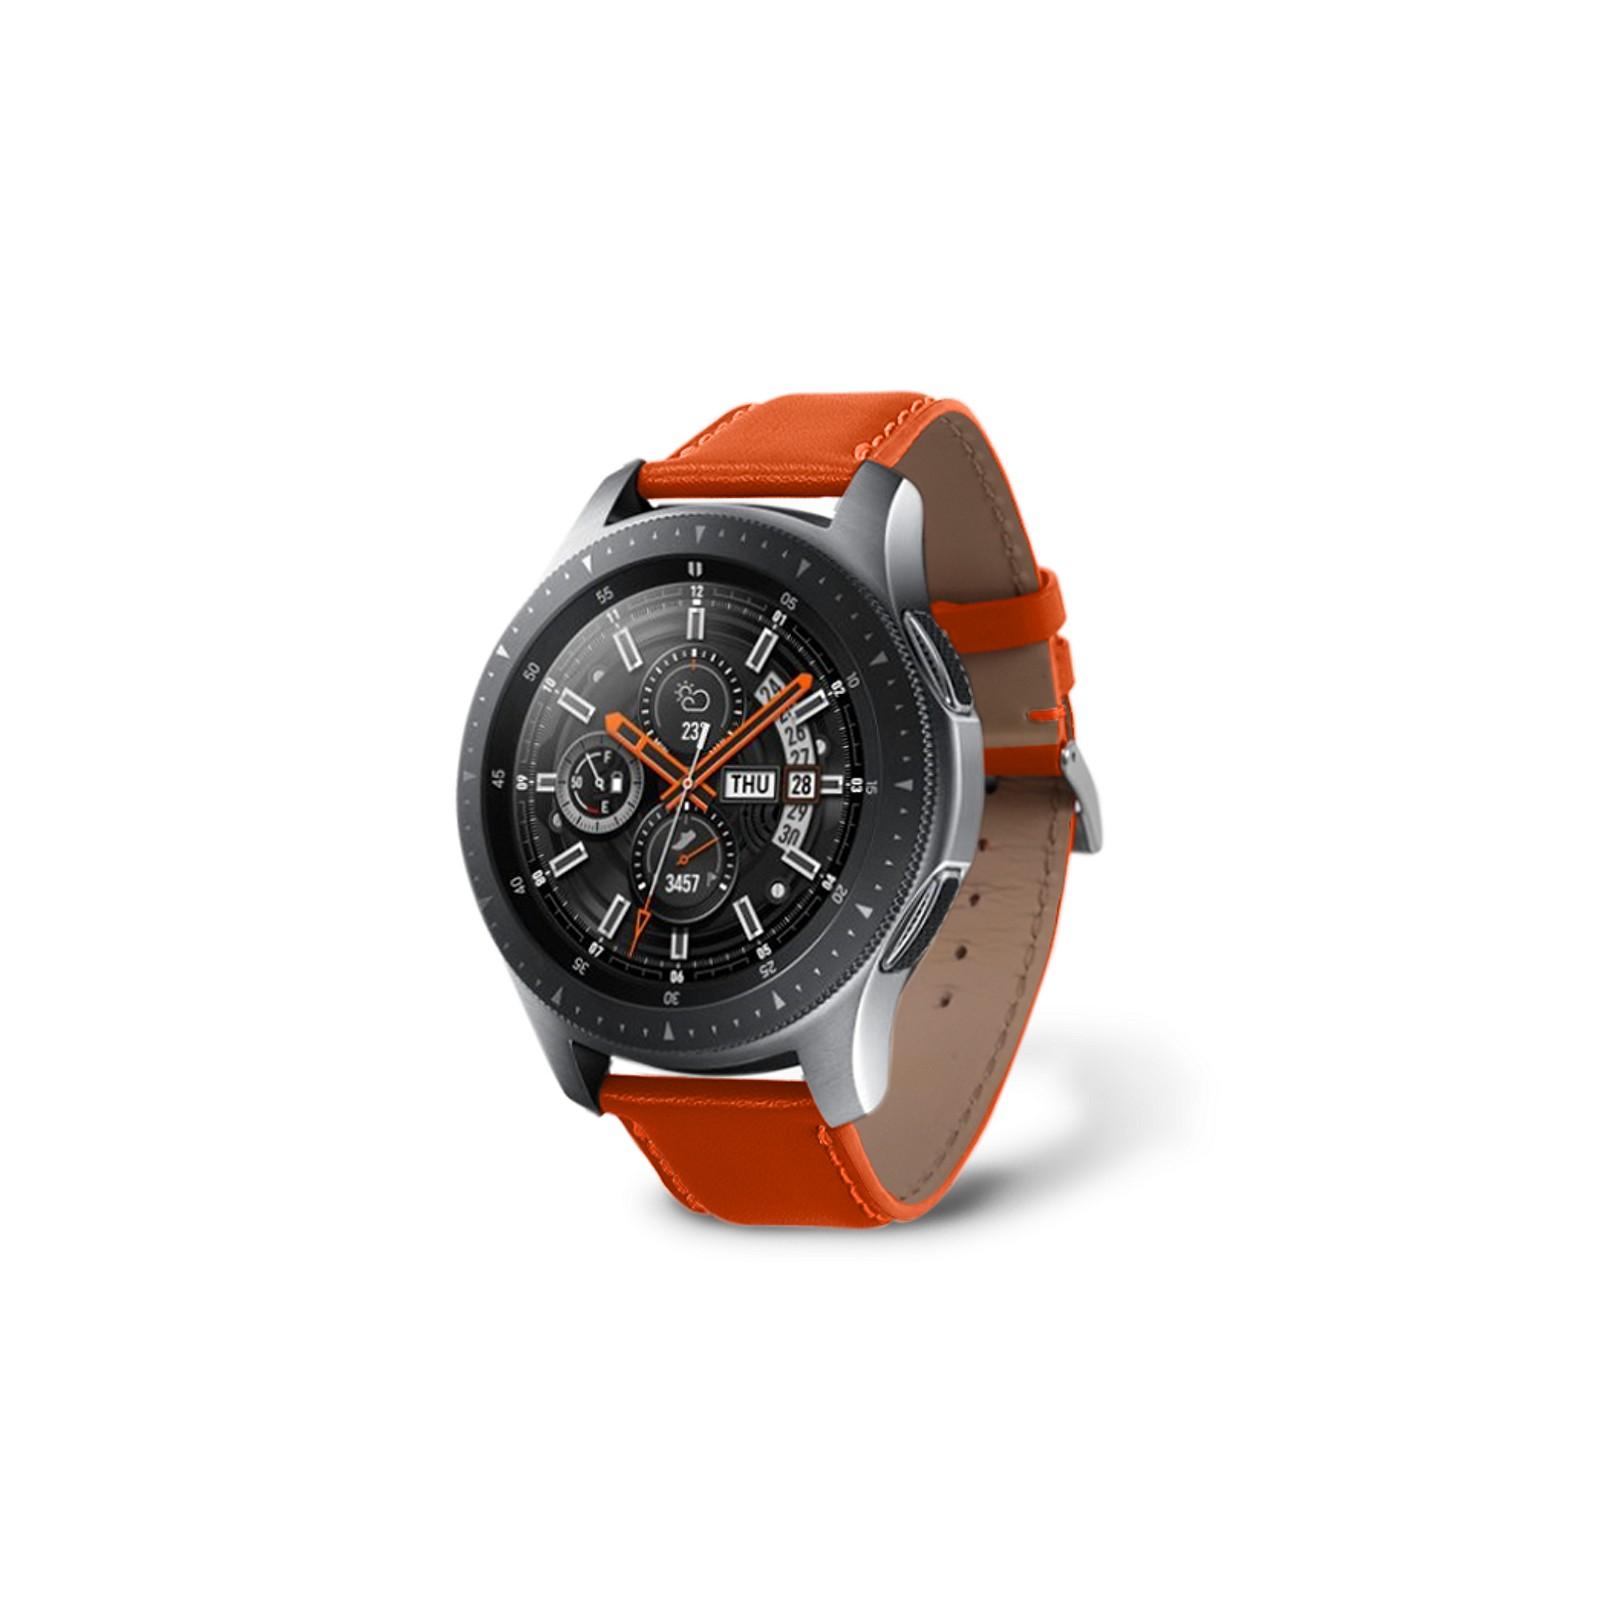 Correa para reloj Samsung Galaxy 46mm Naranja - Piel Liso Correa para reloj  Samsung Galaxy 46mm Naranja - Piel Liso a4a81440be3